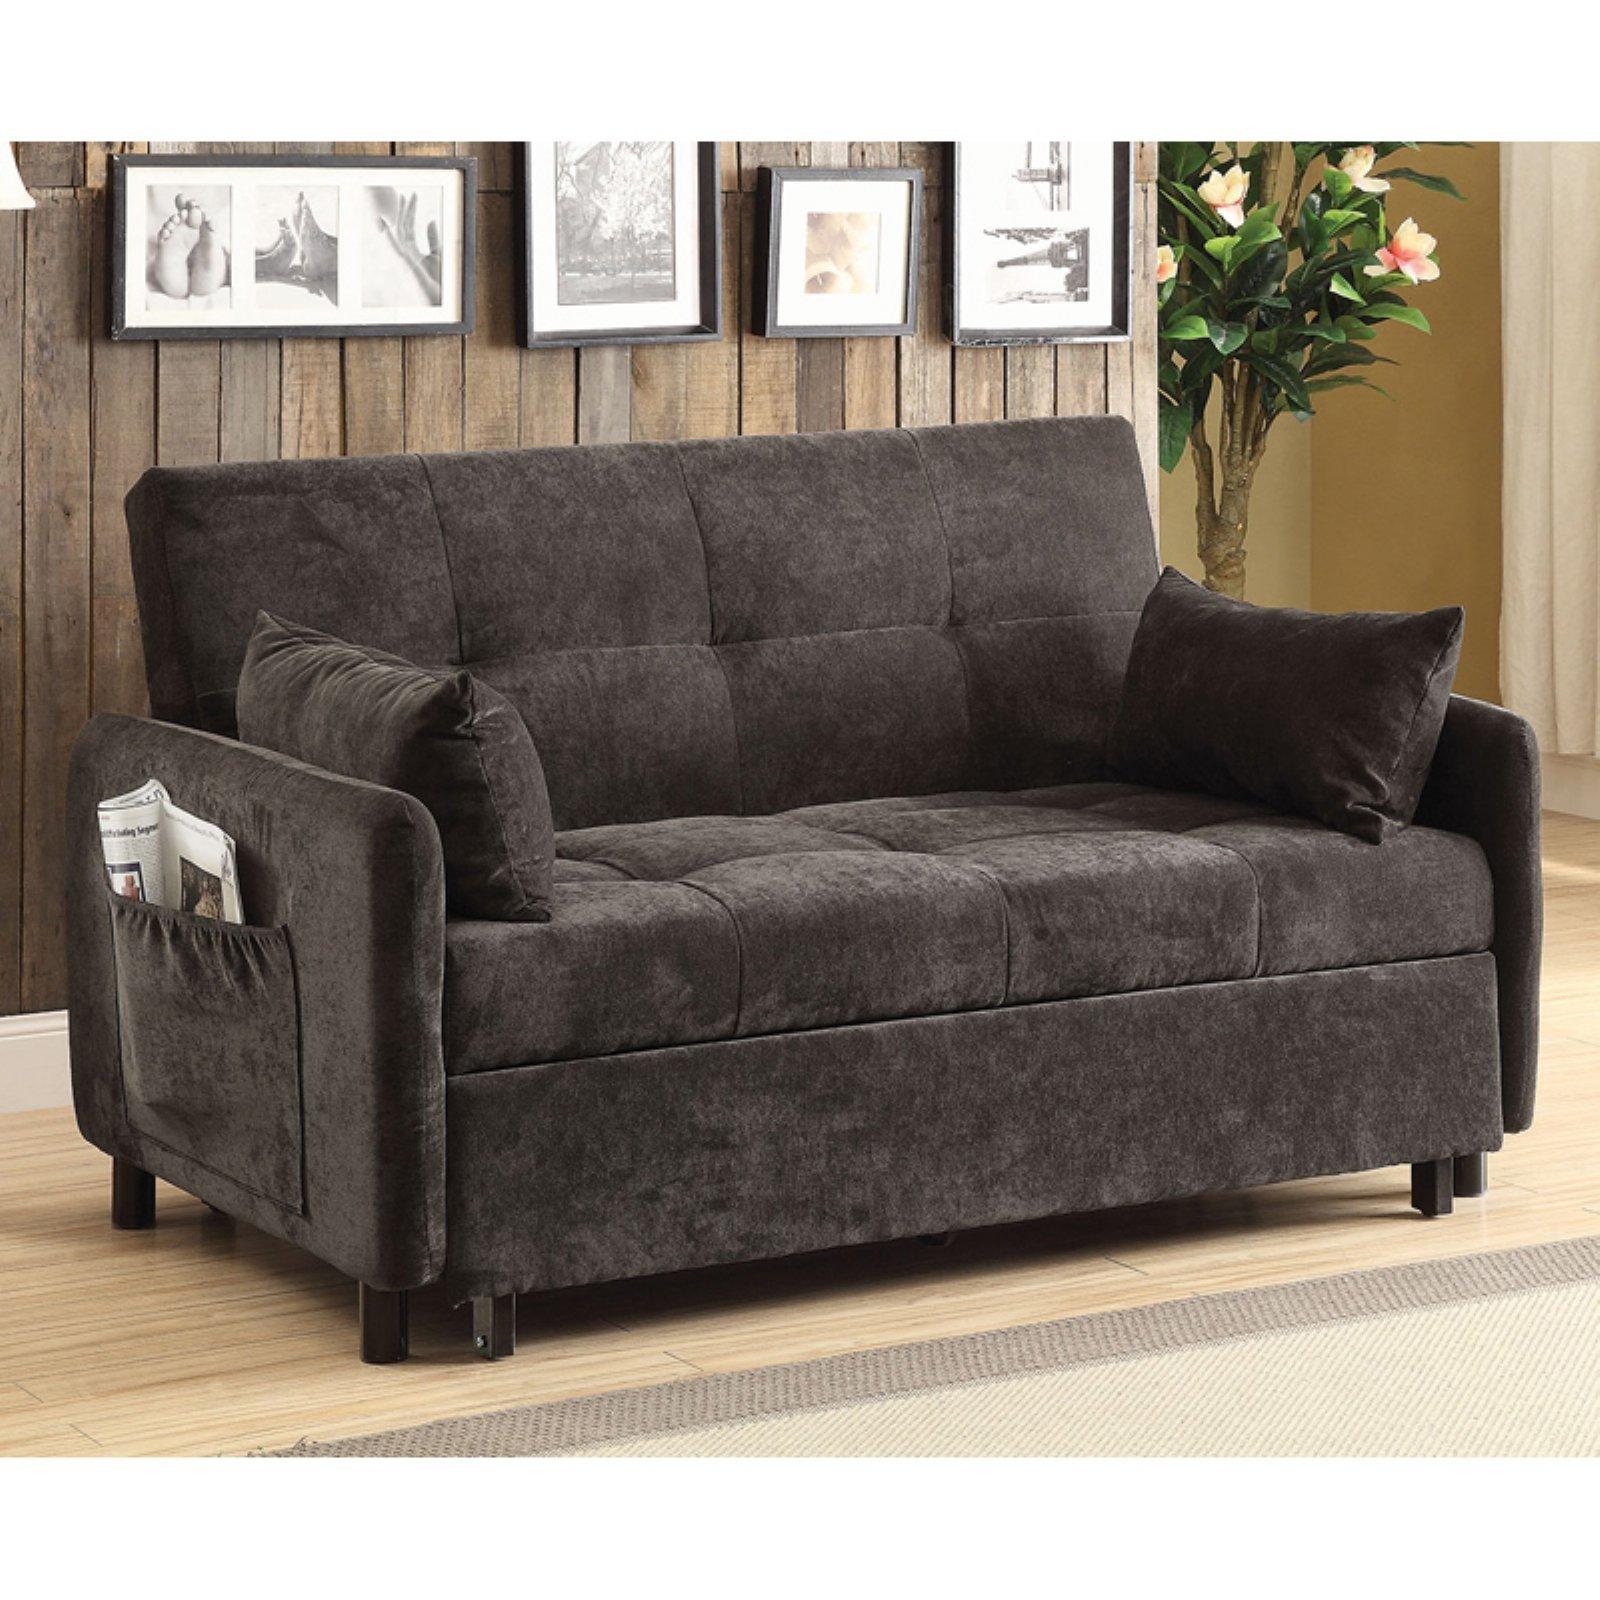 Coaster Company Sofa Bed, Dark Brown with Twill Fabric